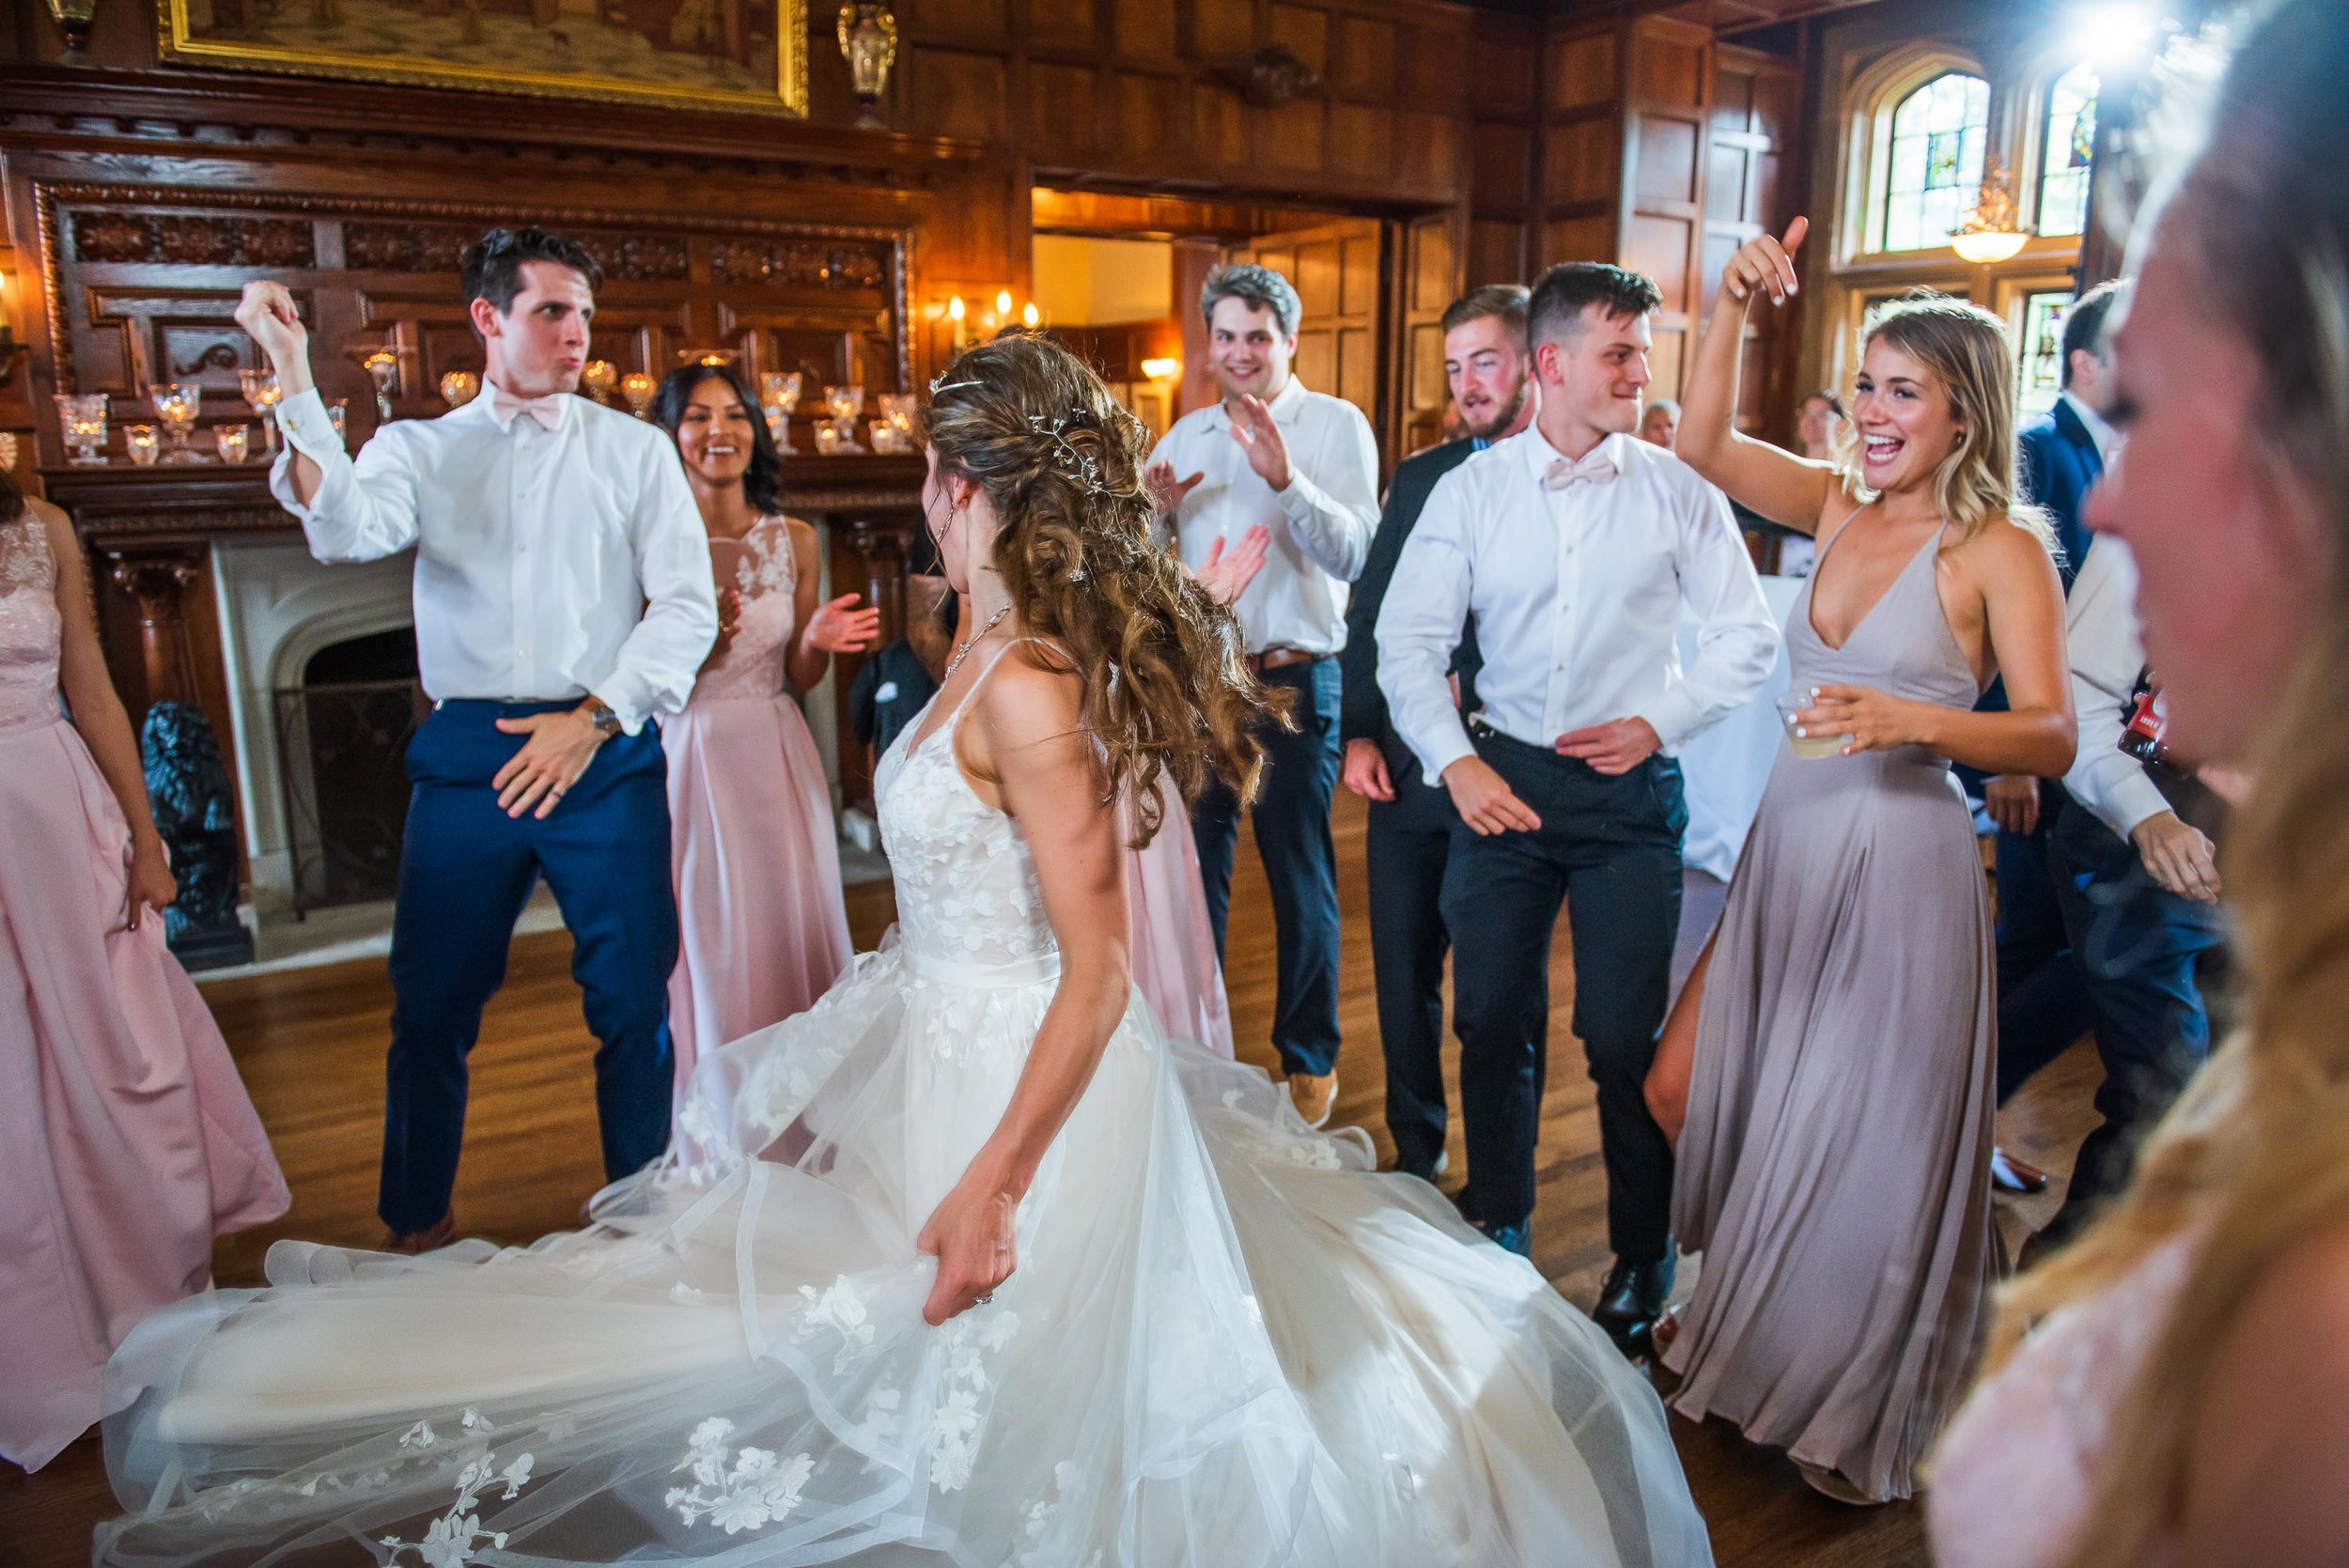 thornewood castle wedding 72.jpg